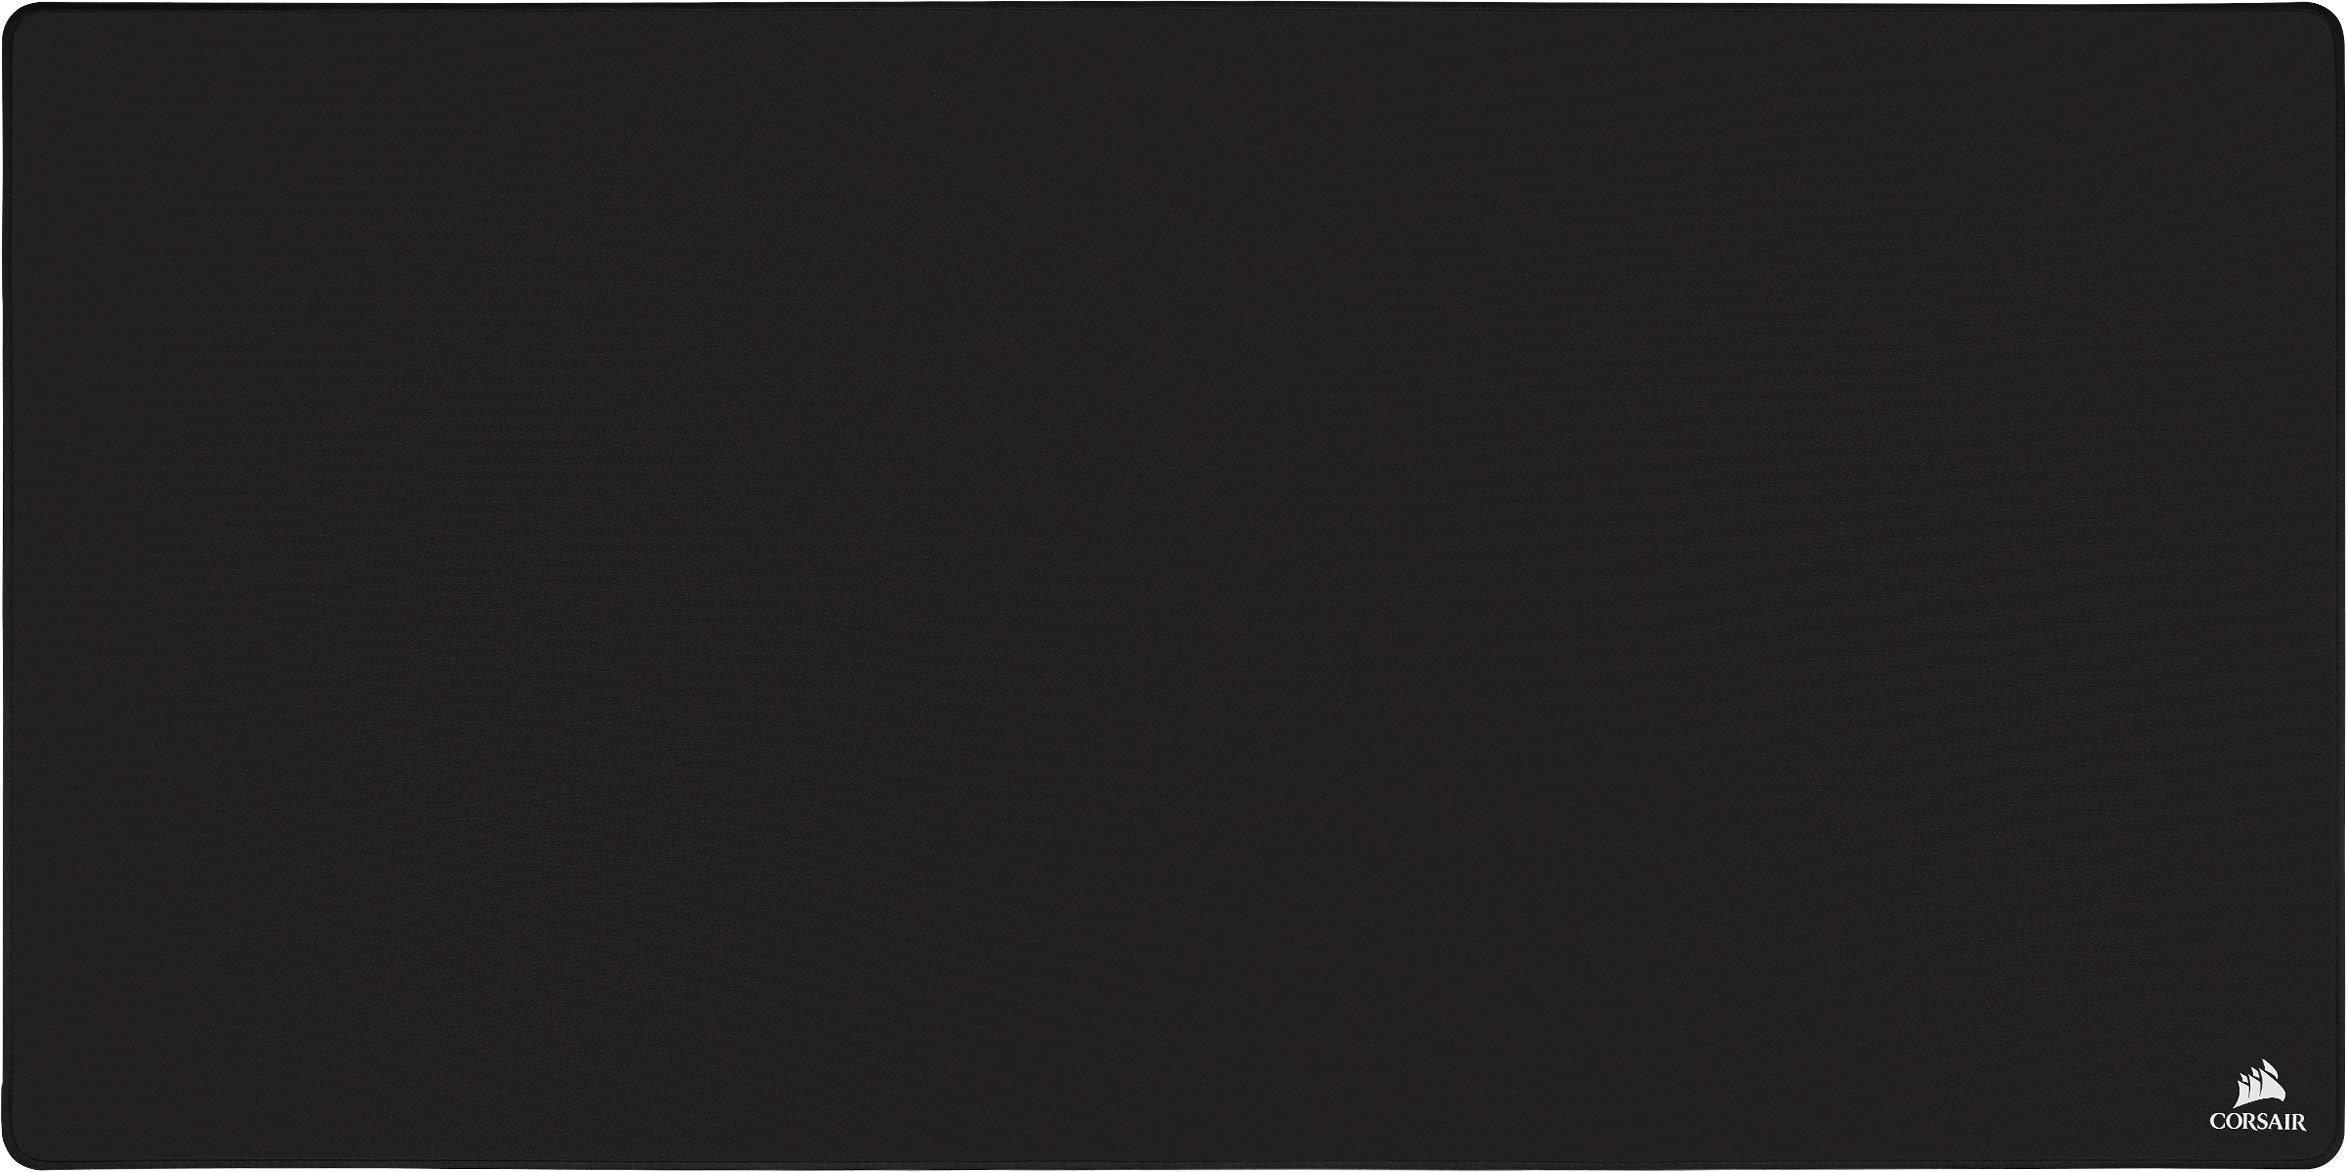 Corsair – Alfombrilla de ratón para Juego